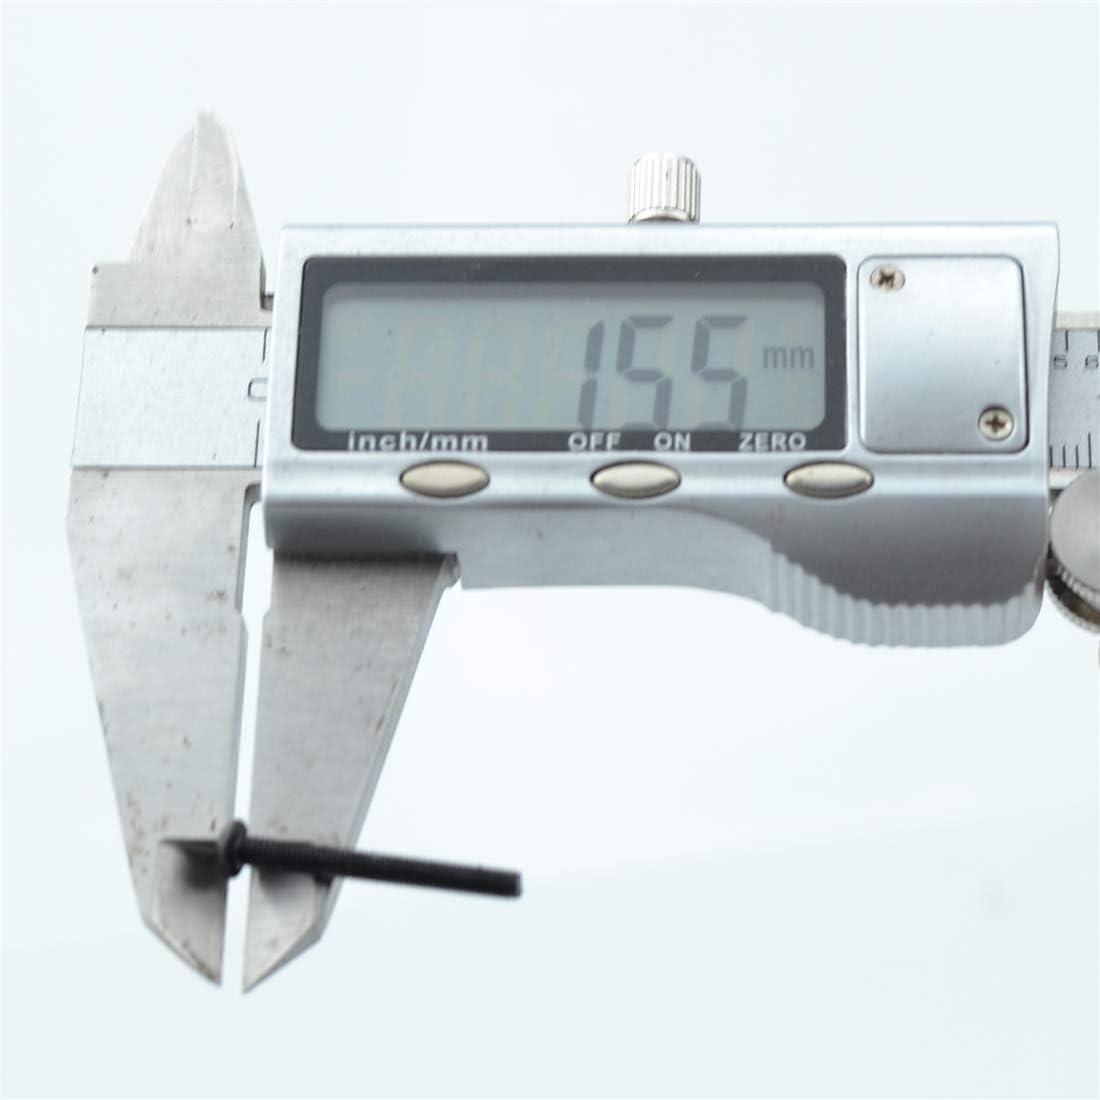 11//16 and 19 mm Bore Diameter A2017 Aluminum NBK MJC-65-GR-11//16-19 Jaw Flexible Coupling Set Screw Type